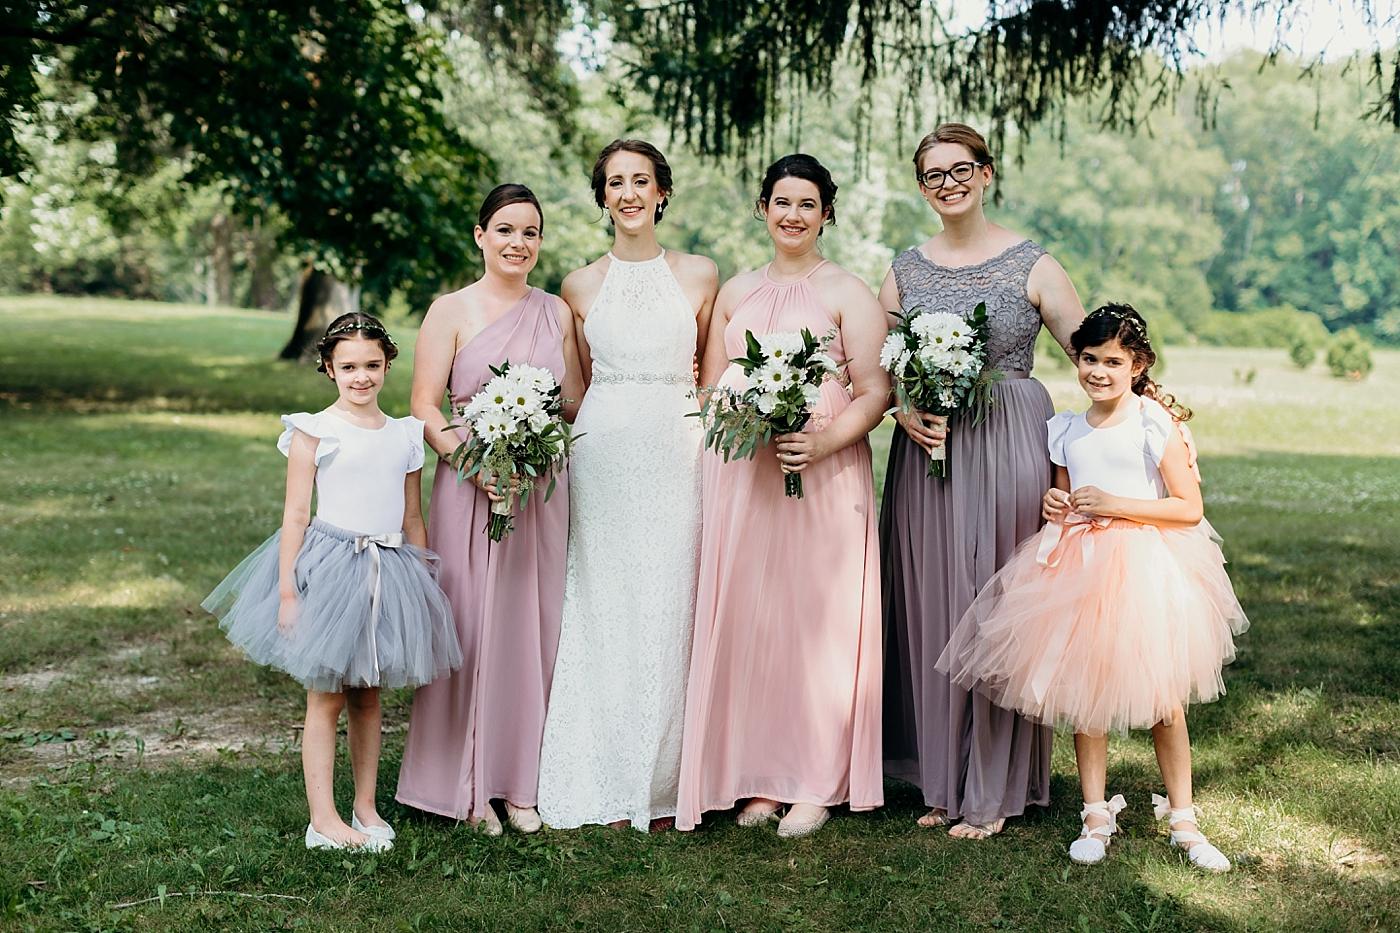 Chateau-Michelle-Wedding-Julia+JuanLuis_TheHeartlandersCo2018LA-153.jpg